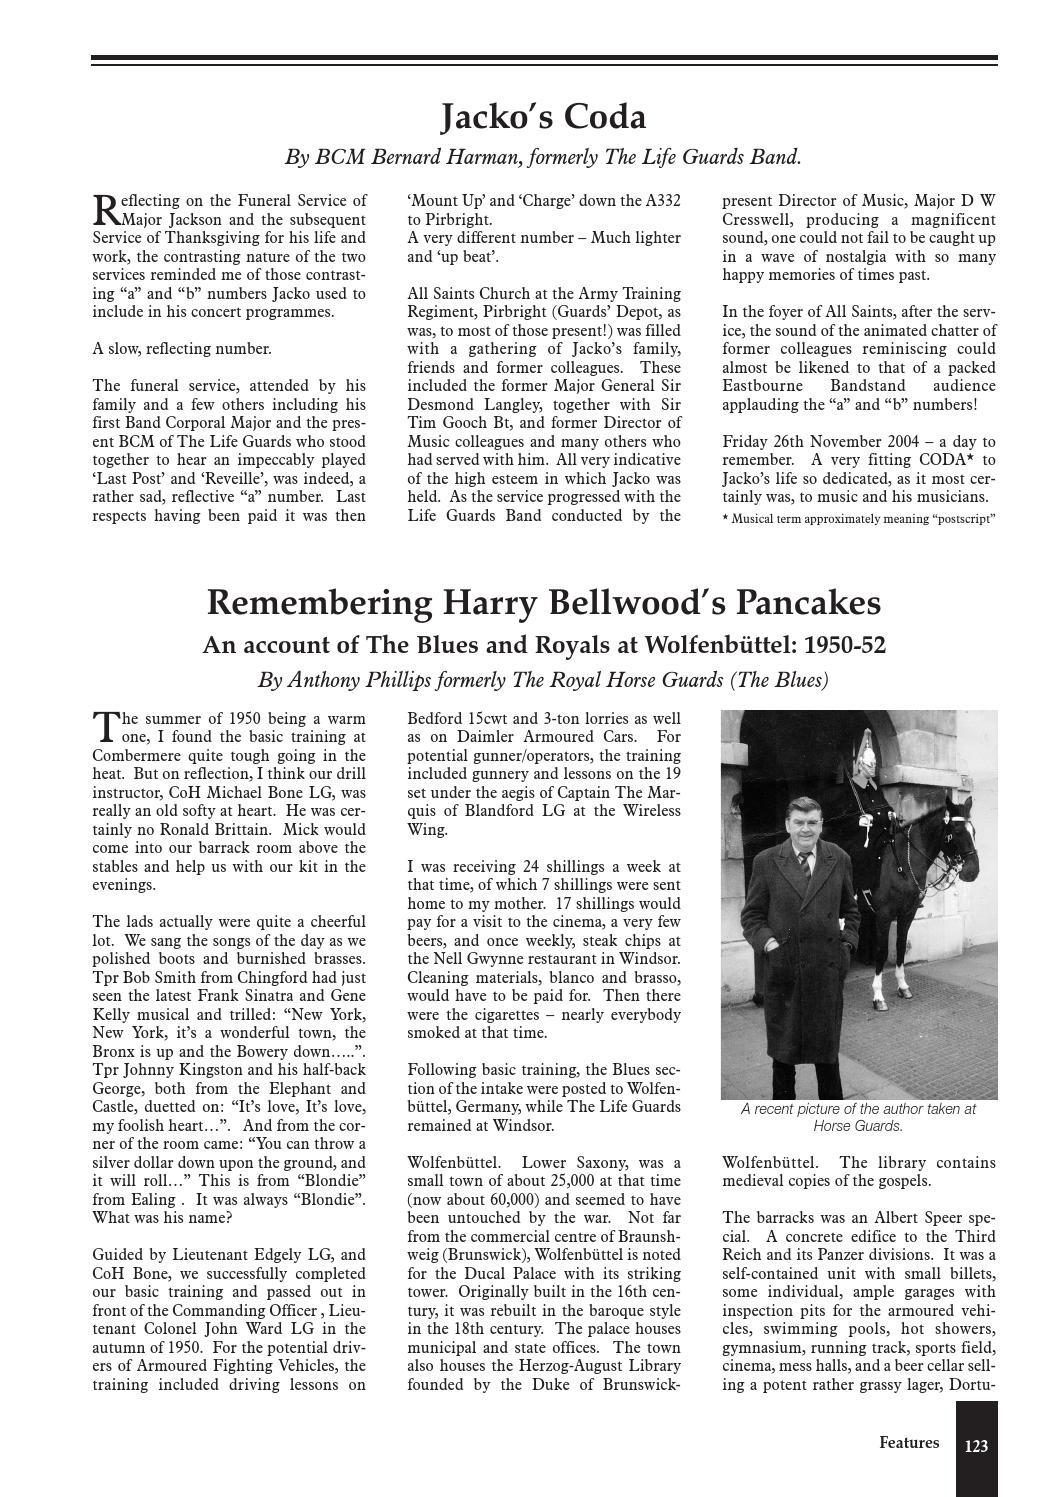 Household Cavalry Journal 2004 by RHG/D Reg Sec - issuu